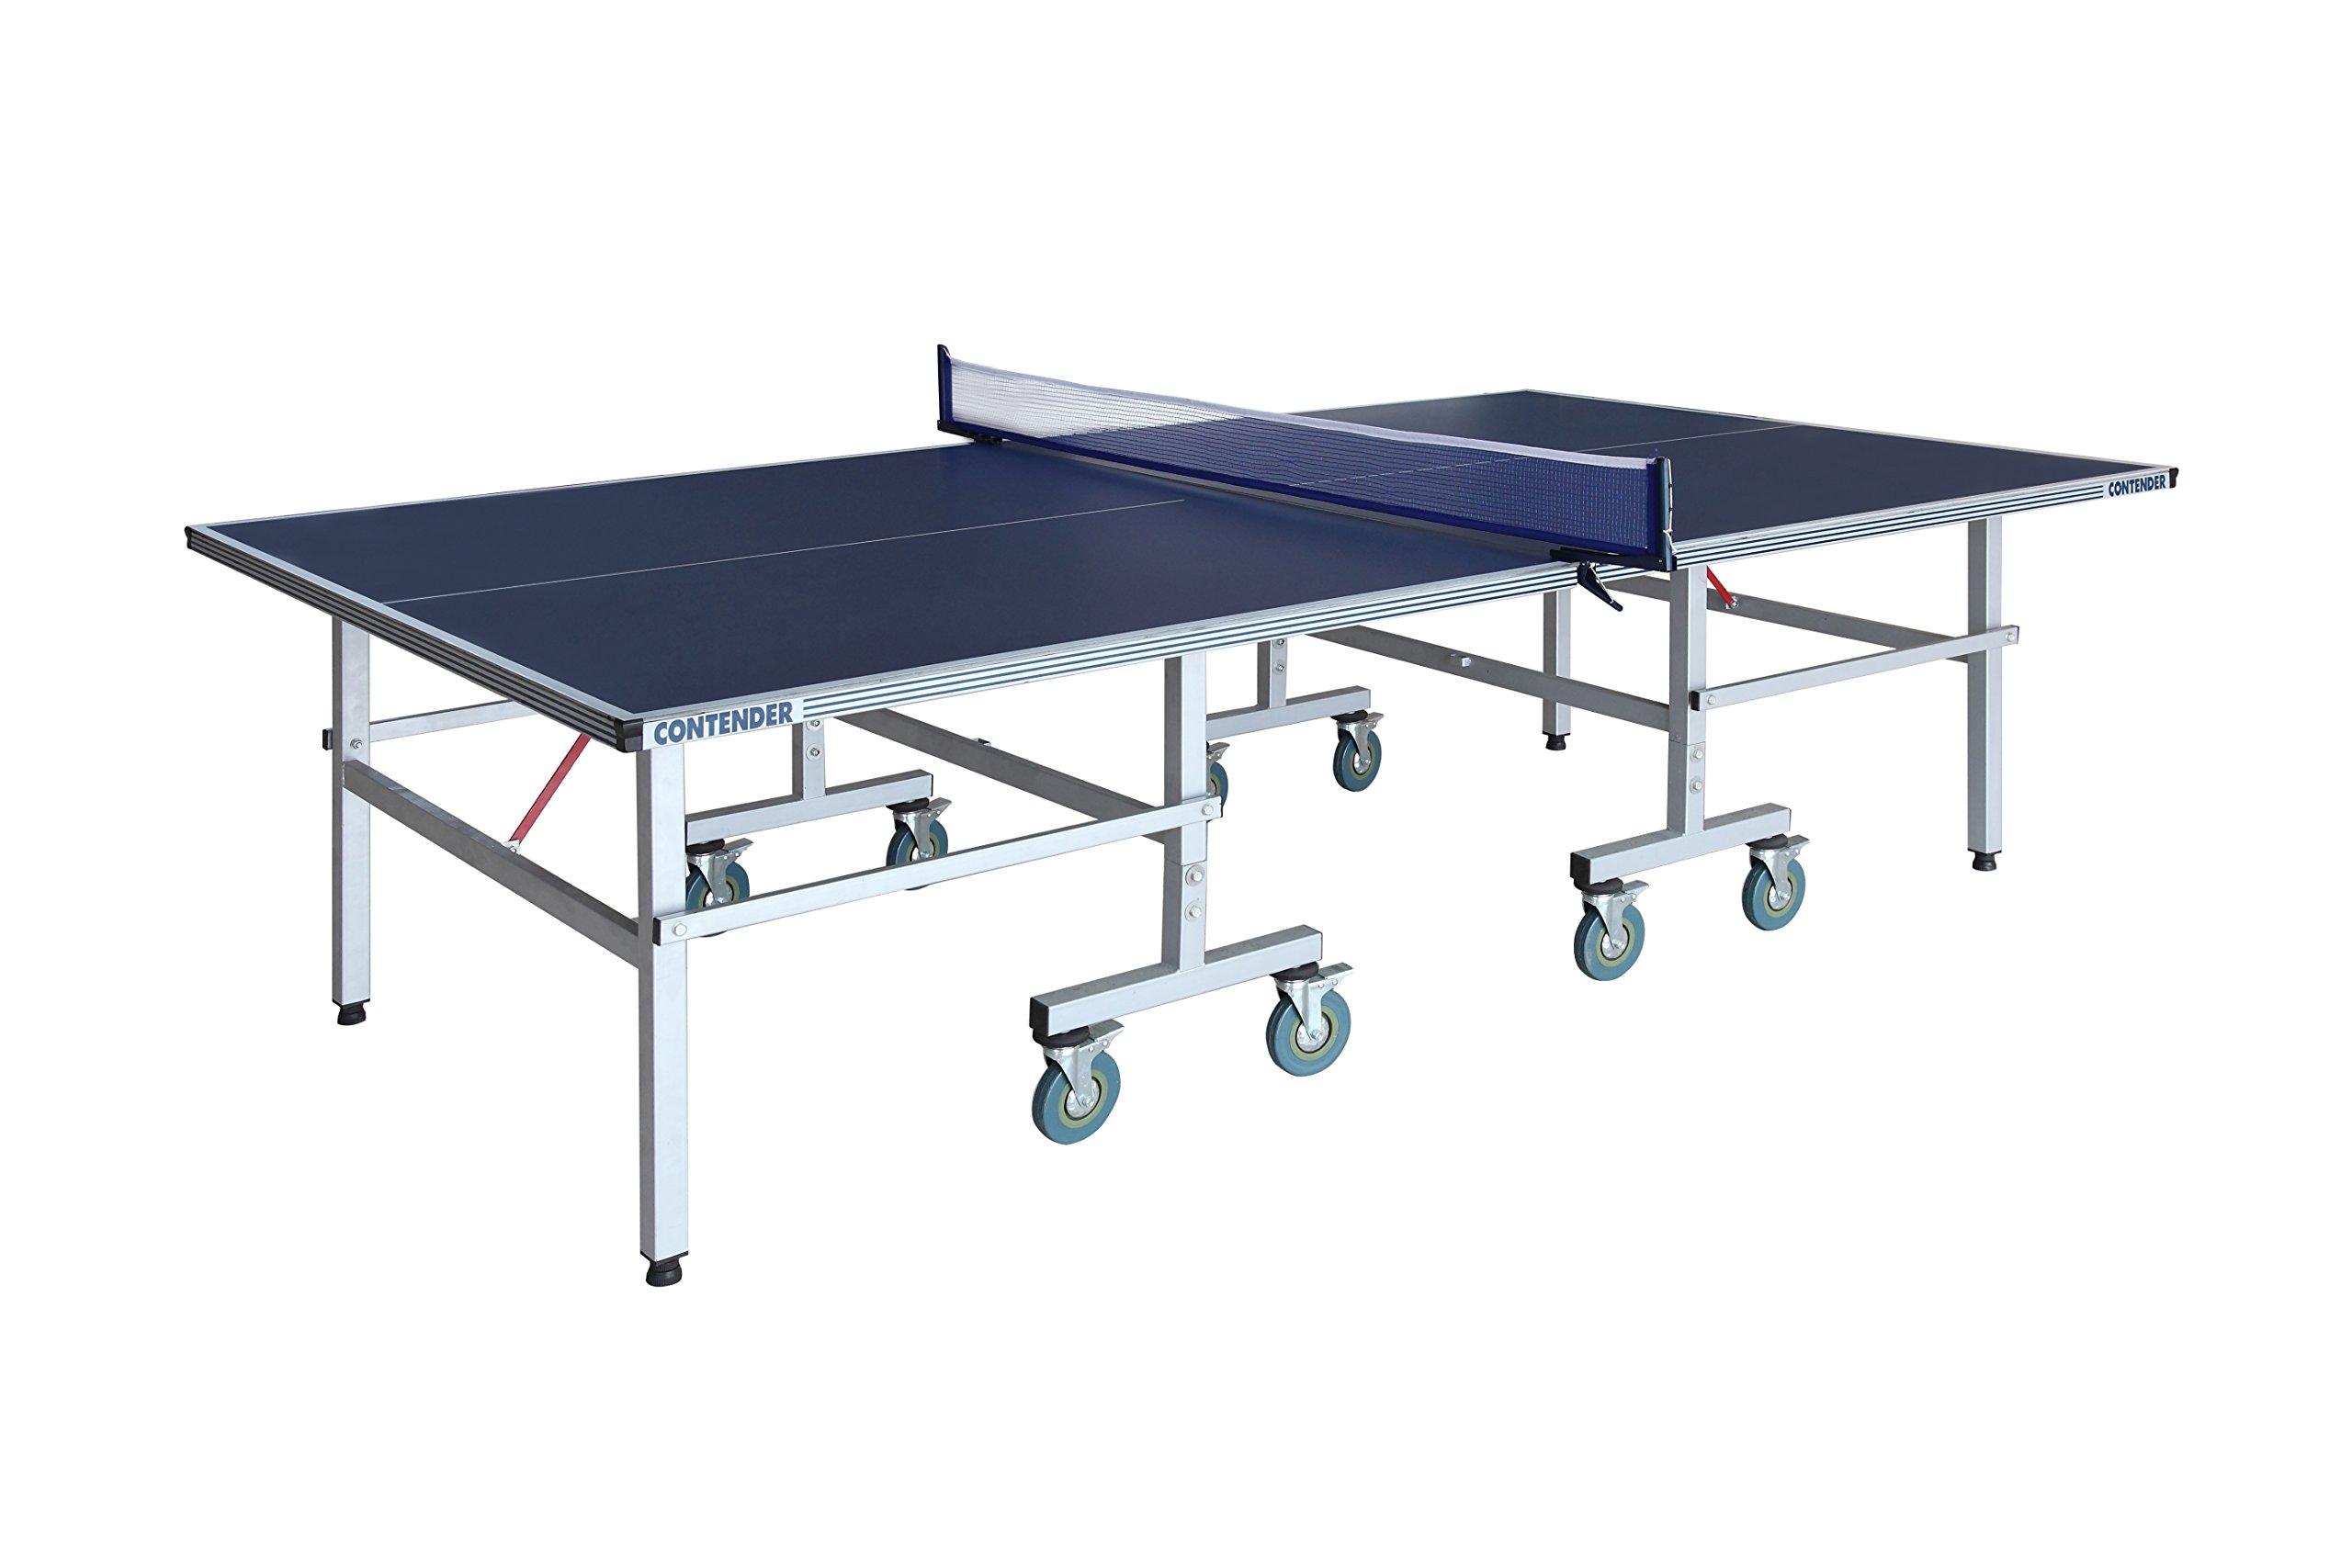 Carmelli NG2336P Contender Outdoor Table Tennis